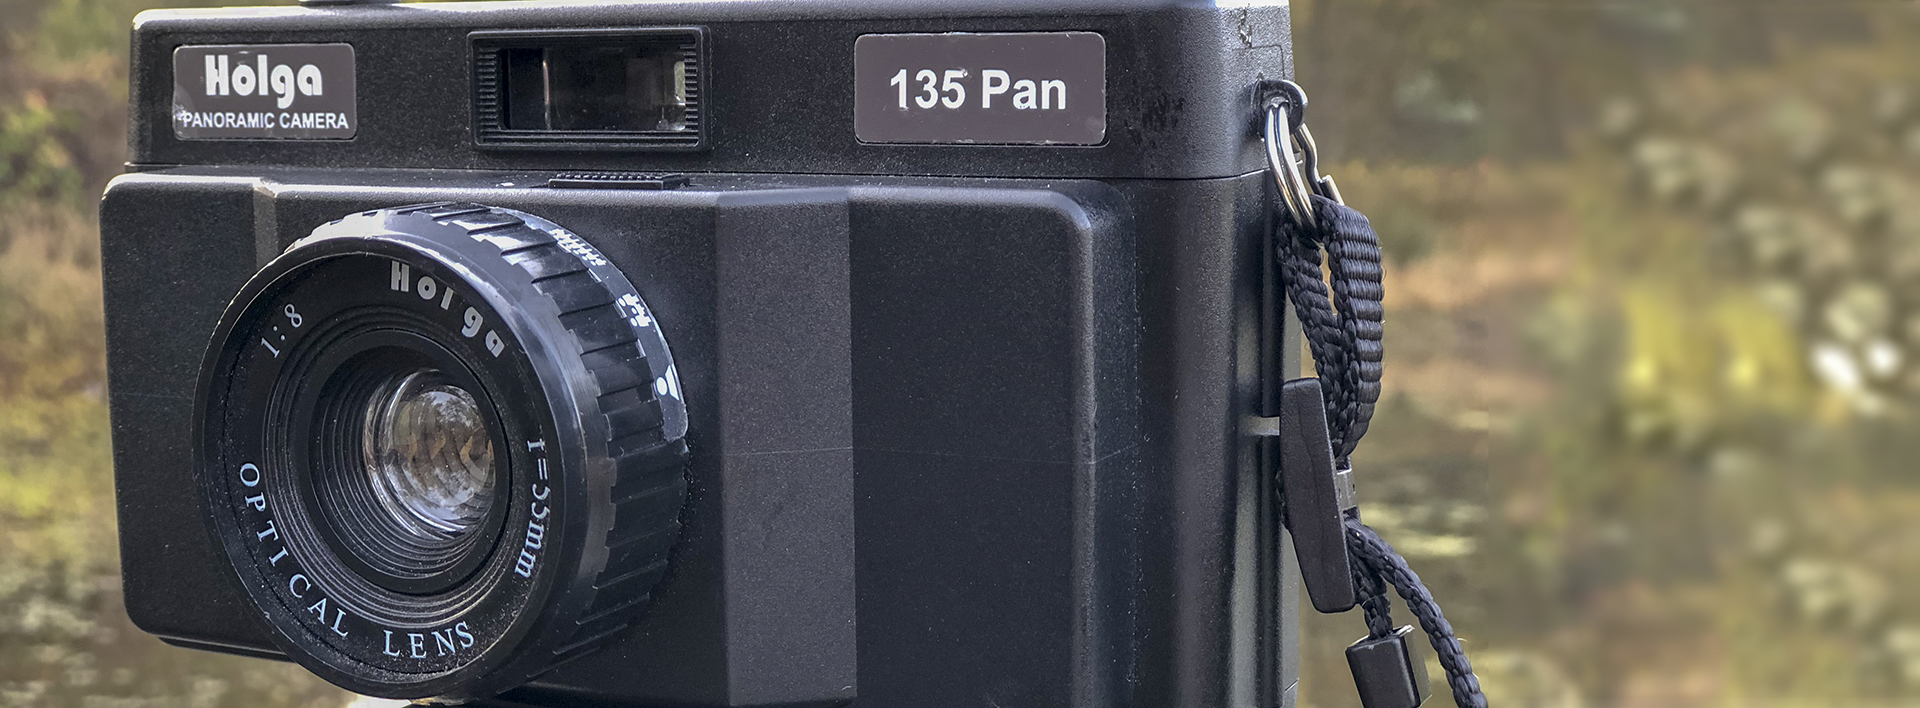 Holga 35mm Panoramic Camera